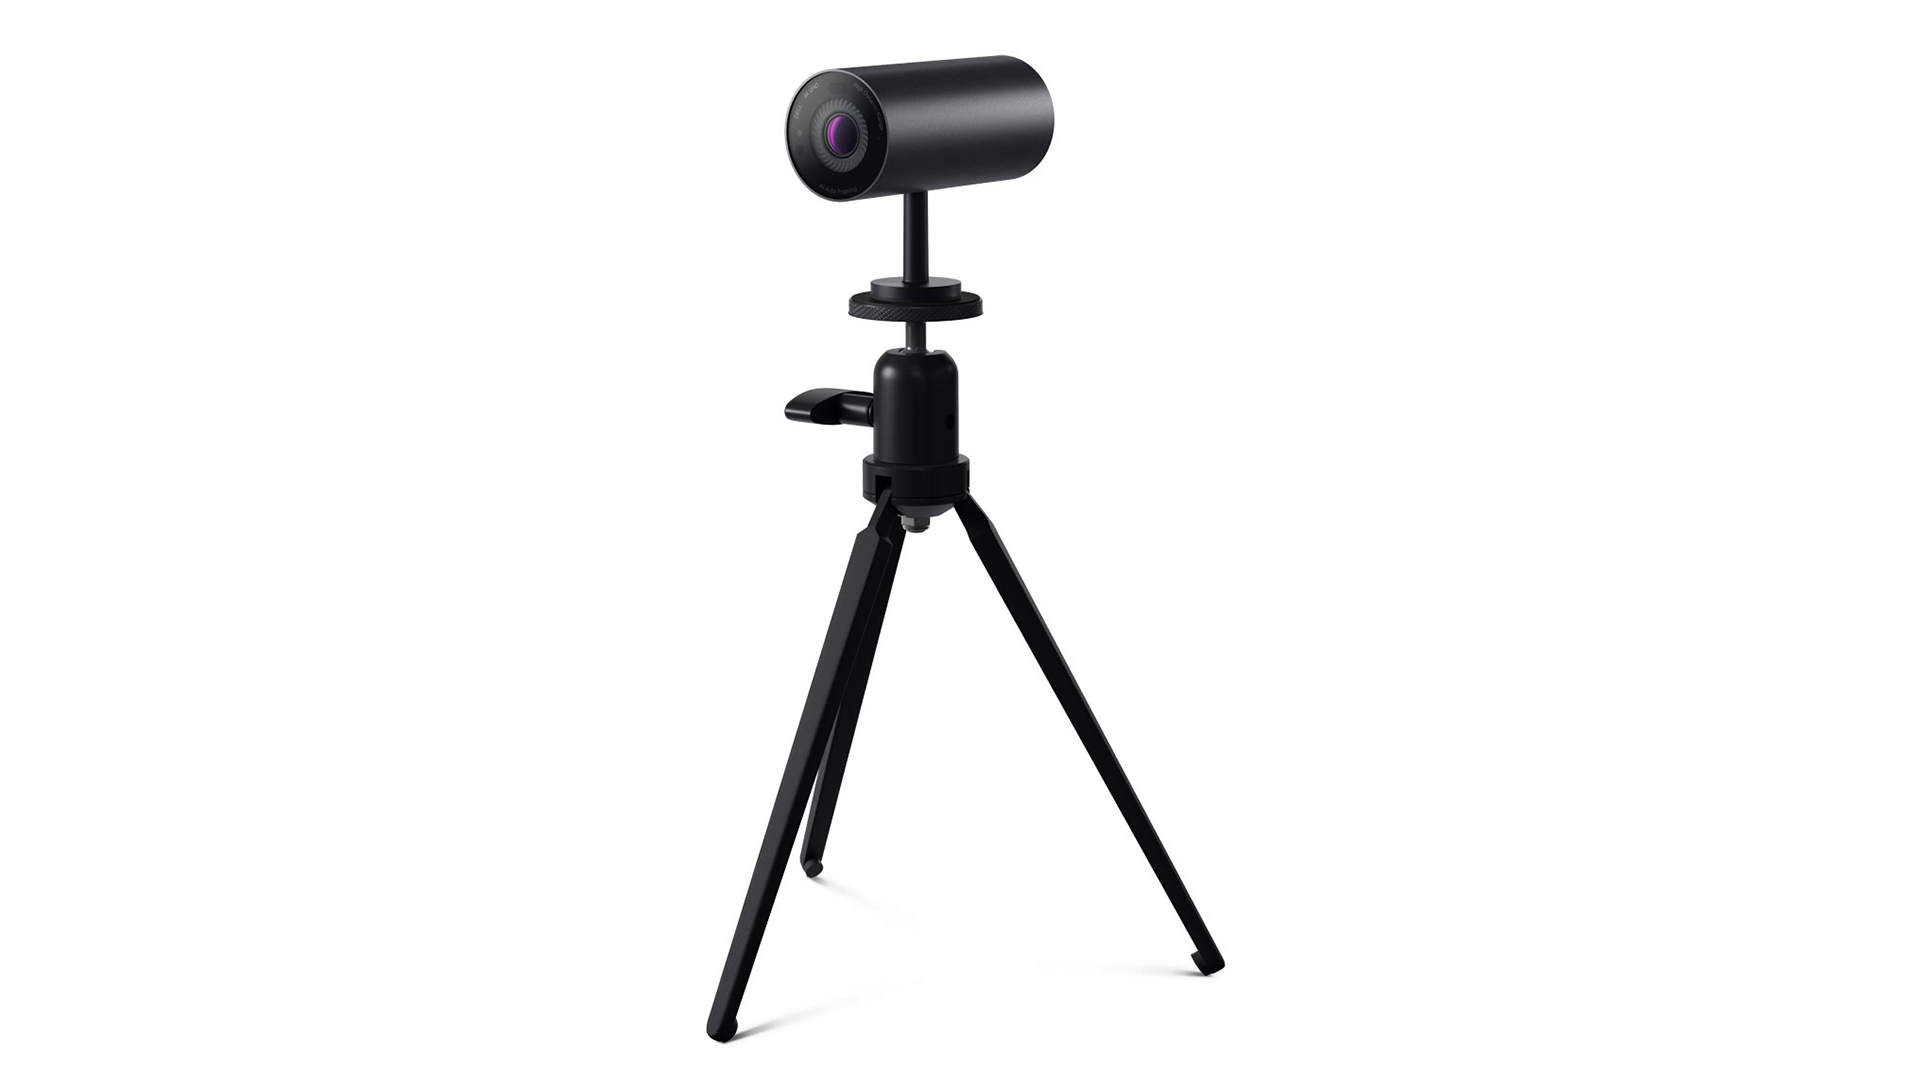 The Dell Ultrasharp Webcam on a tripod.